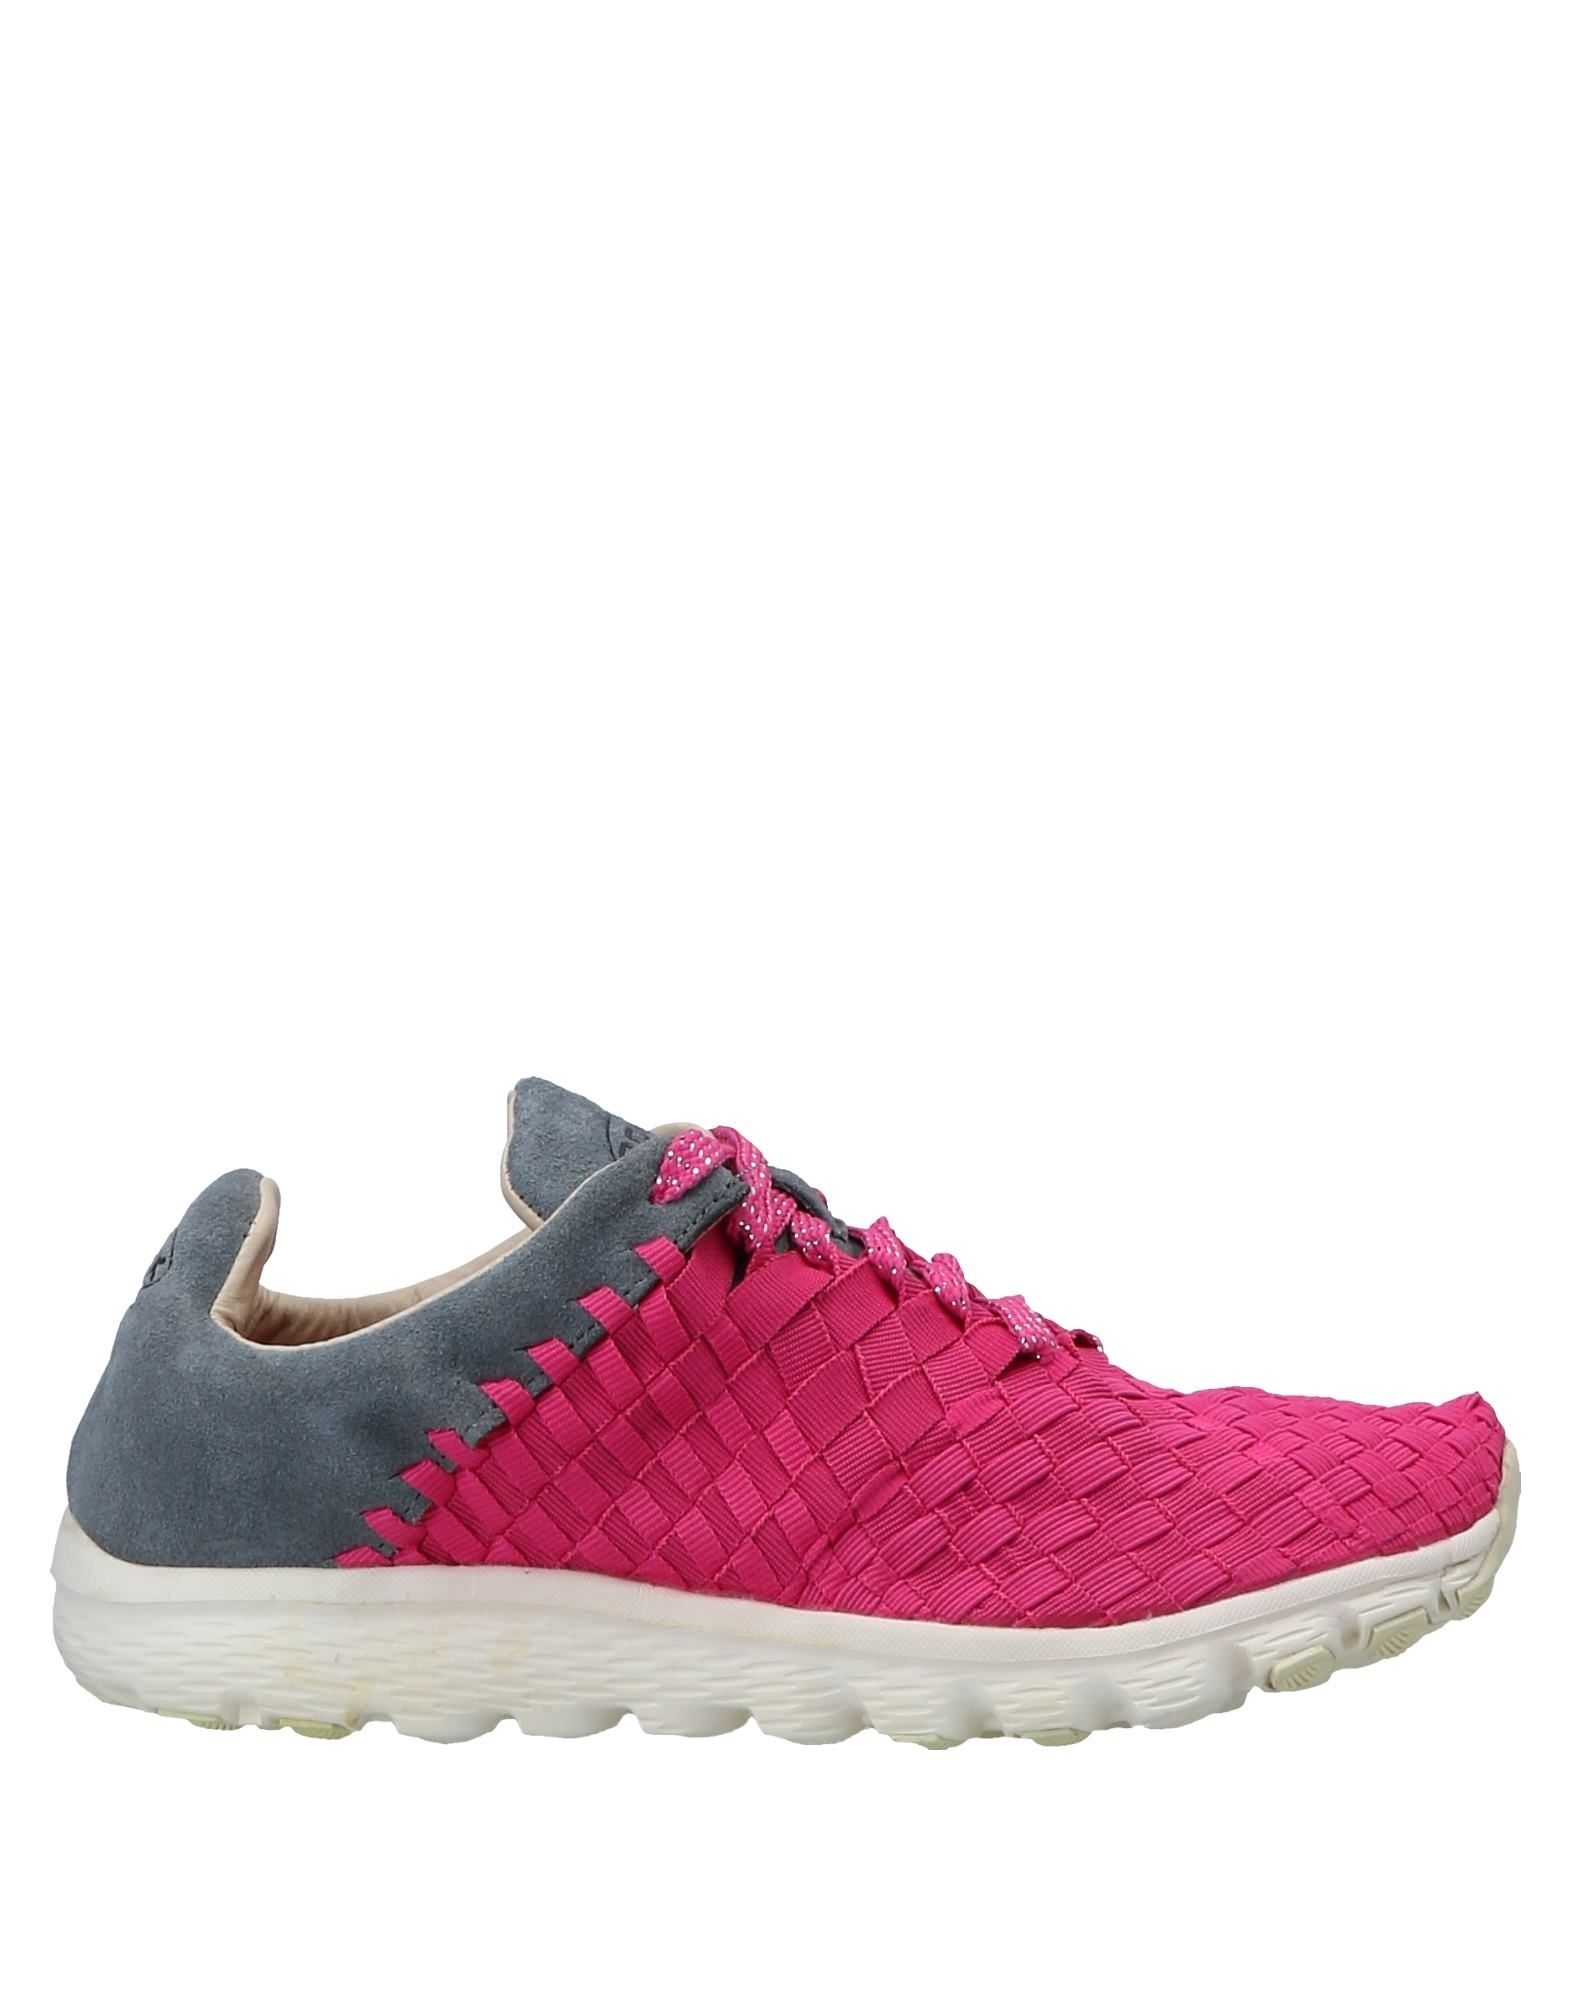 Rock 11562060XW Spring Sneakers Damen  11562060XW Rock Gute Qualität beliebte Schuhe cf5988